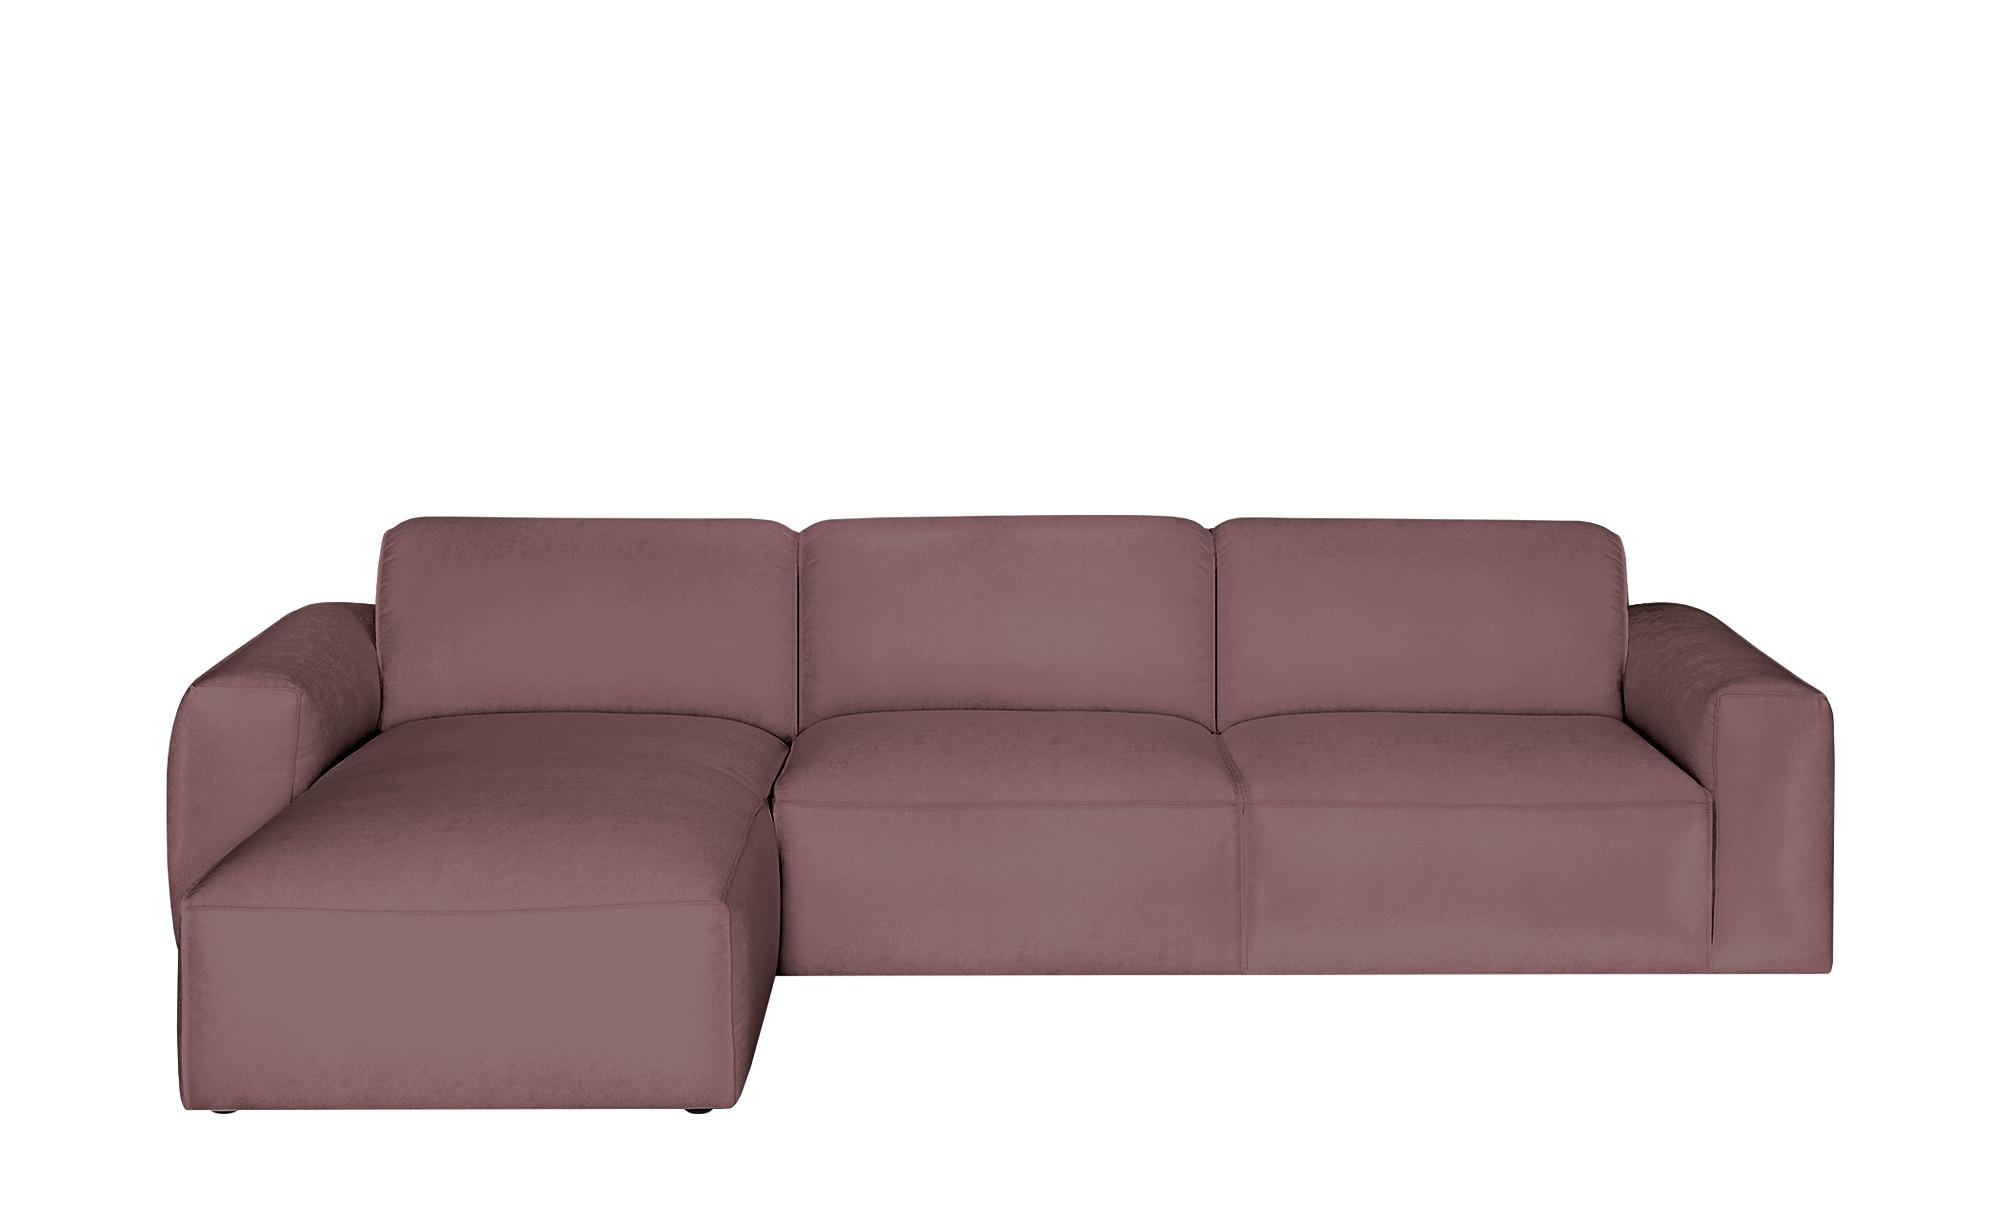 Gray & Jones Ecksofa  Factory ¦ rot ¦ Maße (cm): H: 75 T: 100 Polstermöbel > Sofas > Ecksofas - Höffner